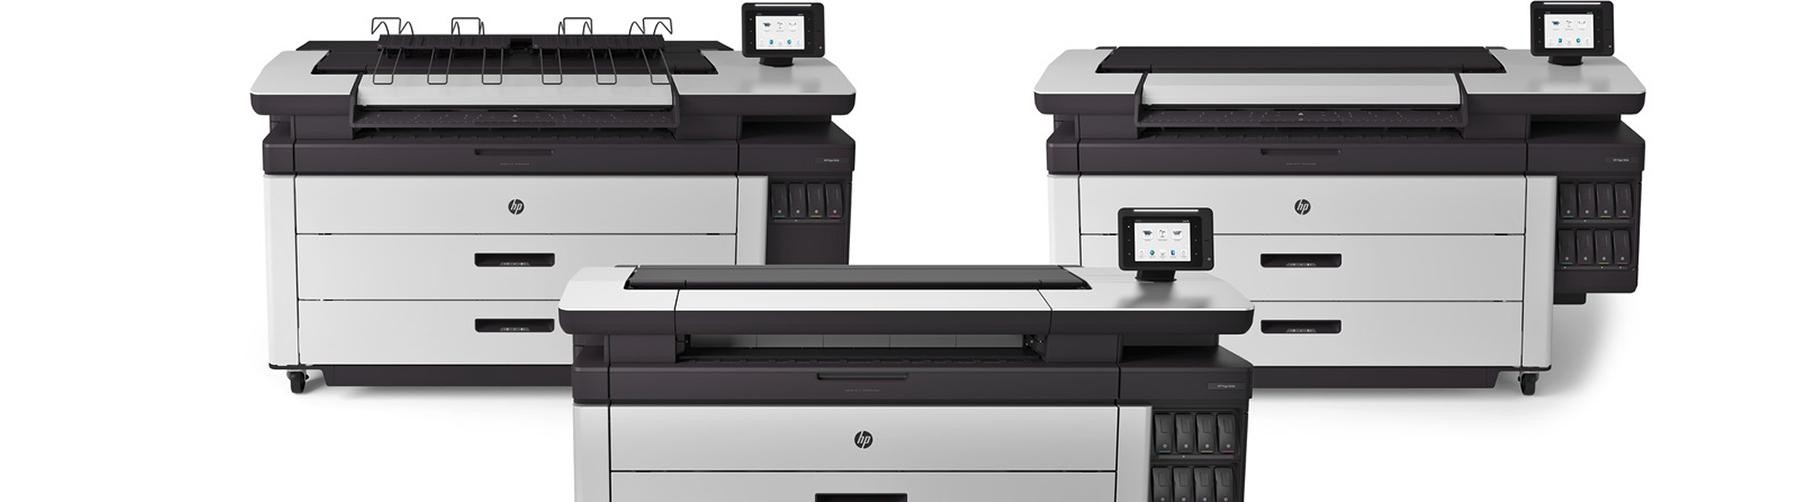 HP PageWide XL Printer